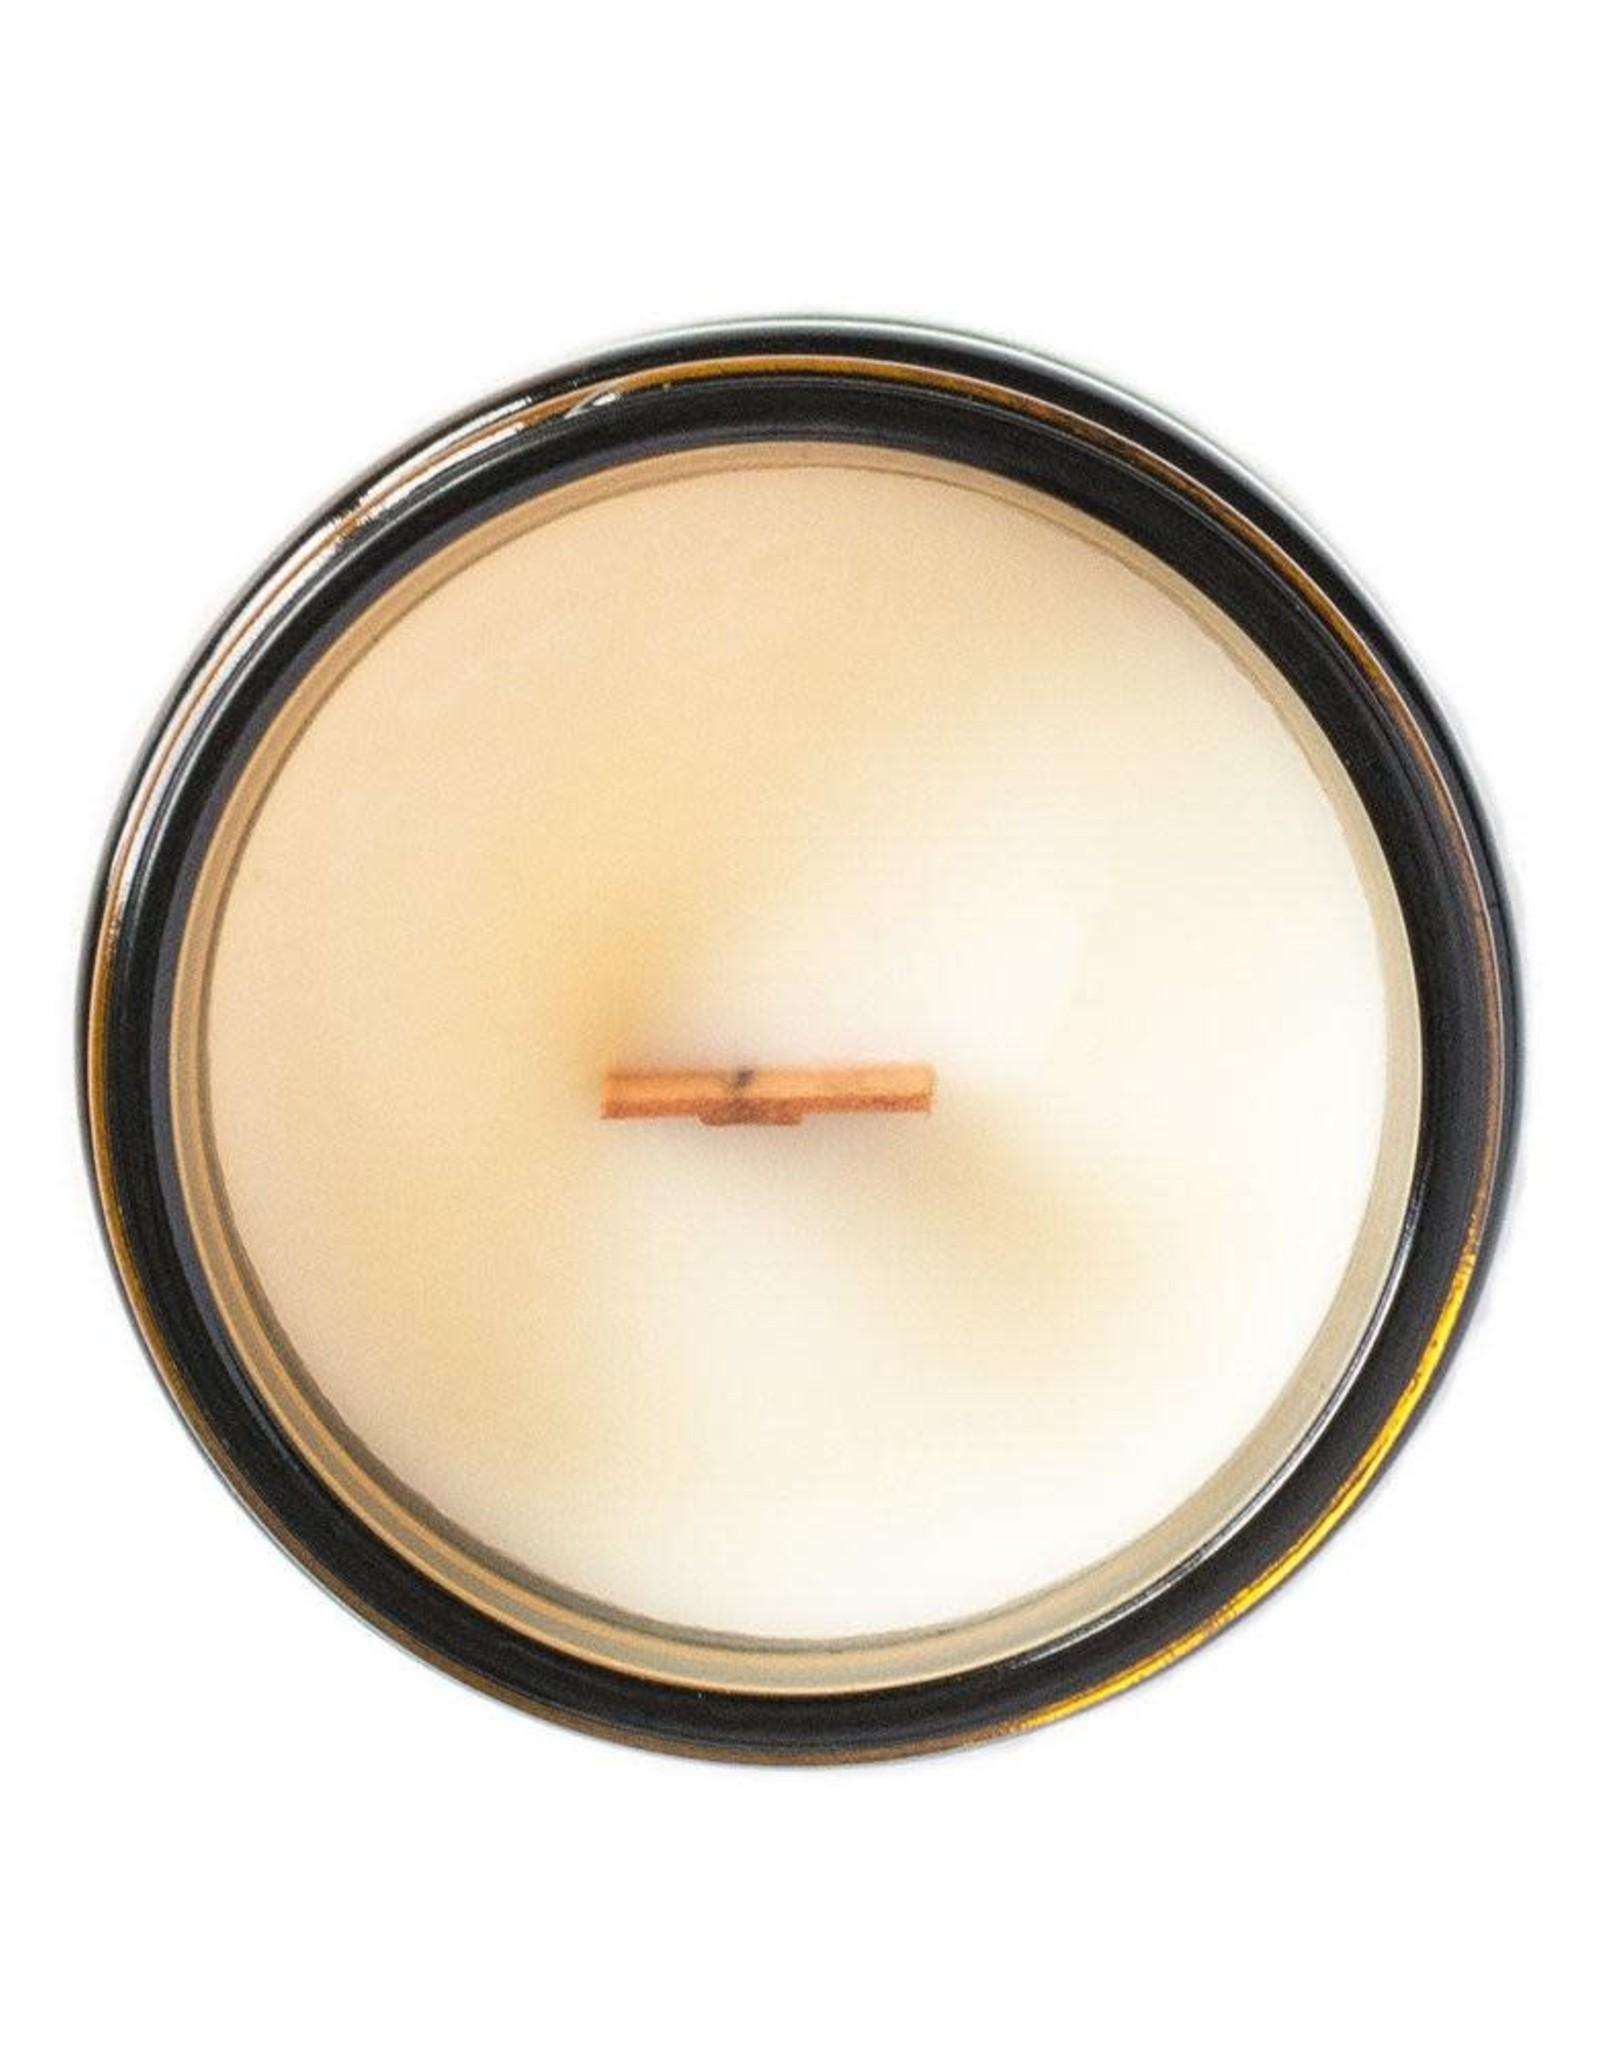 Sugi tree studio Wood Wick Candle - Roasted Pine